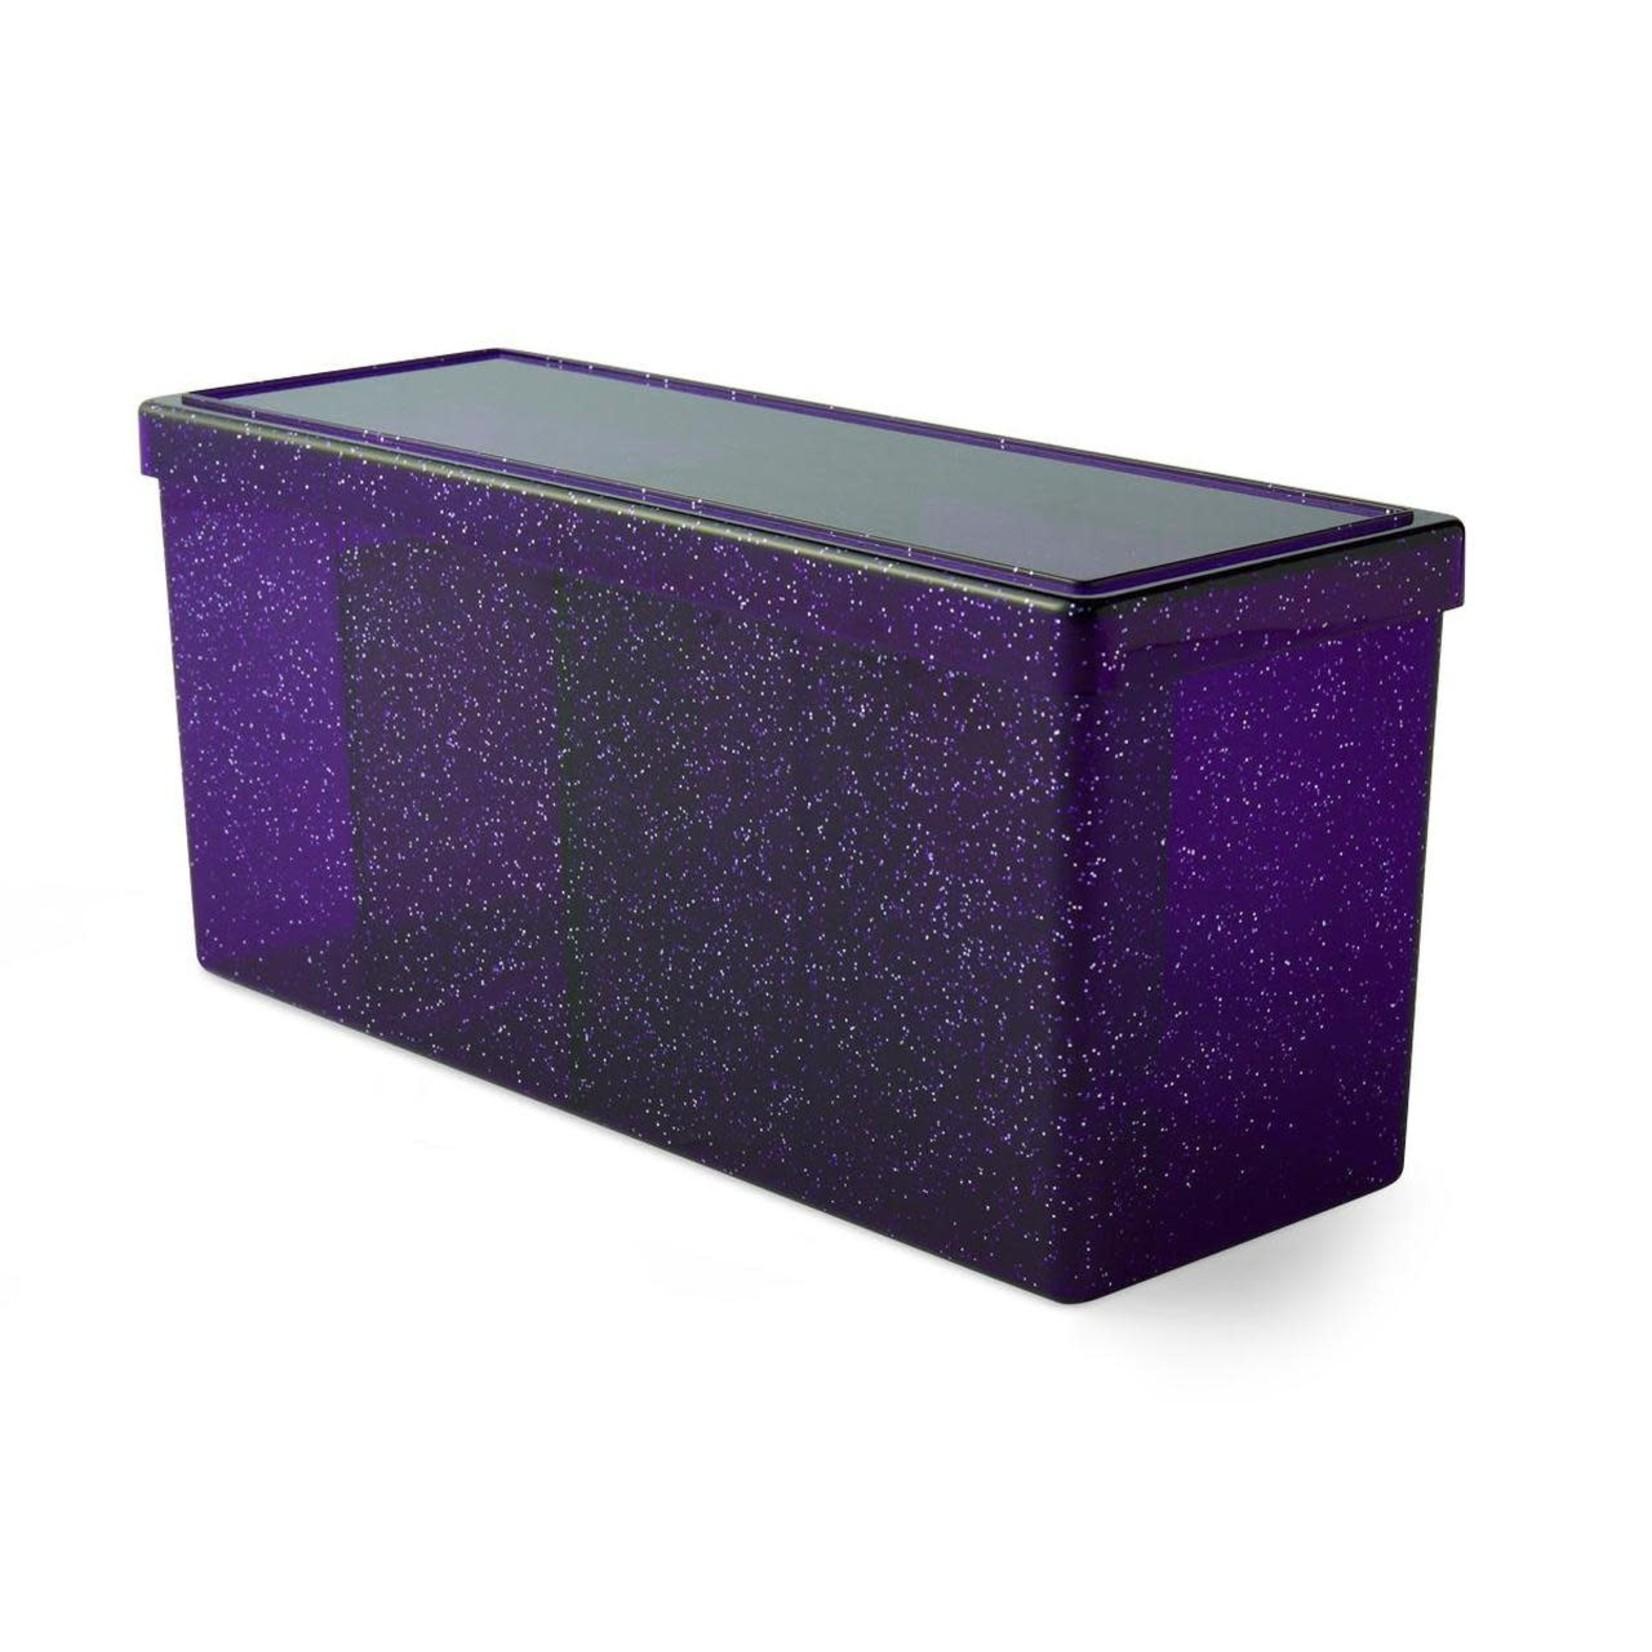 Arcane Tinman Dragon Shield: 4 Compartment Deckbox - Night Blue